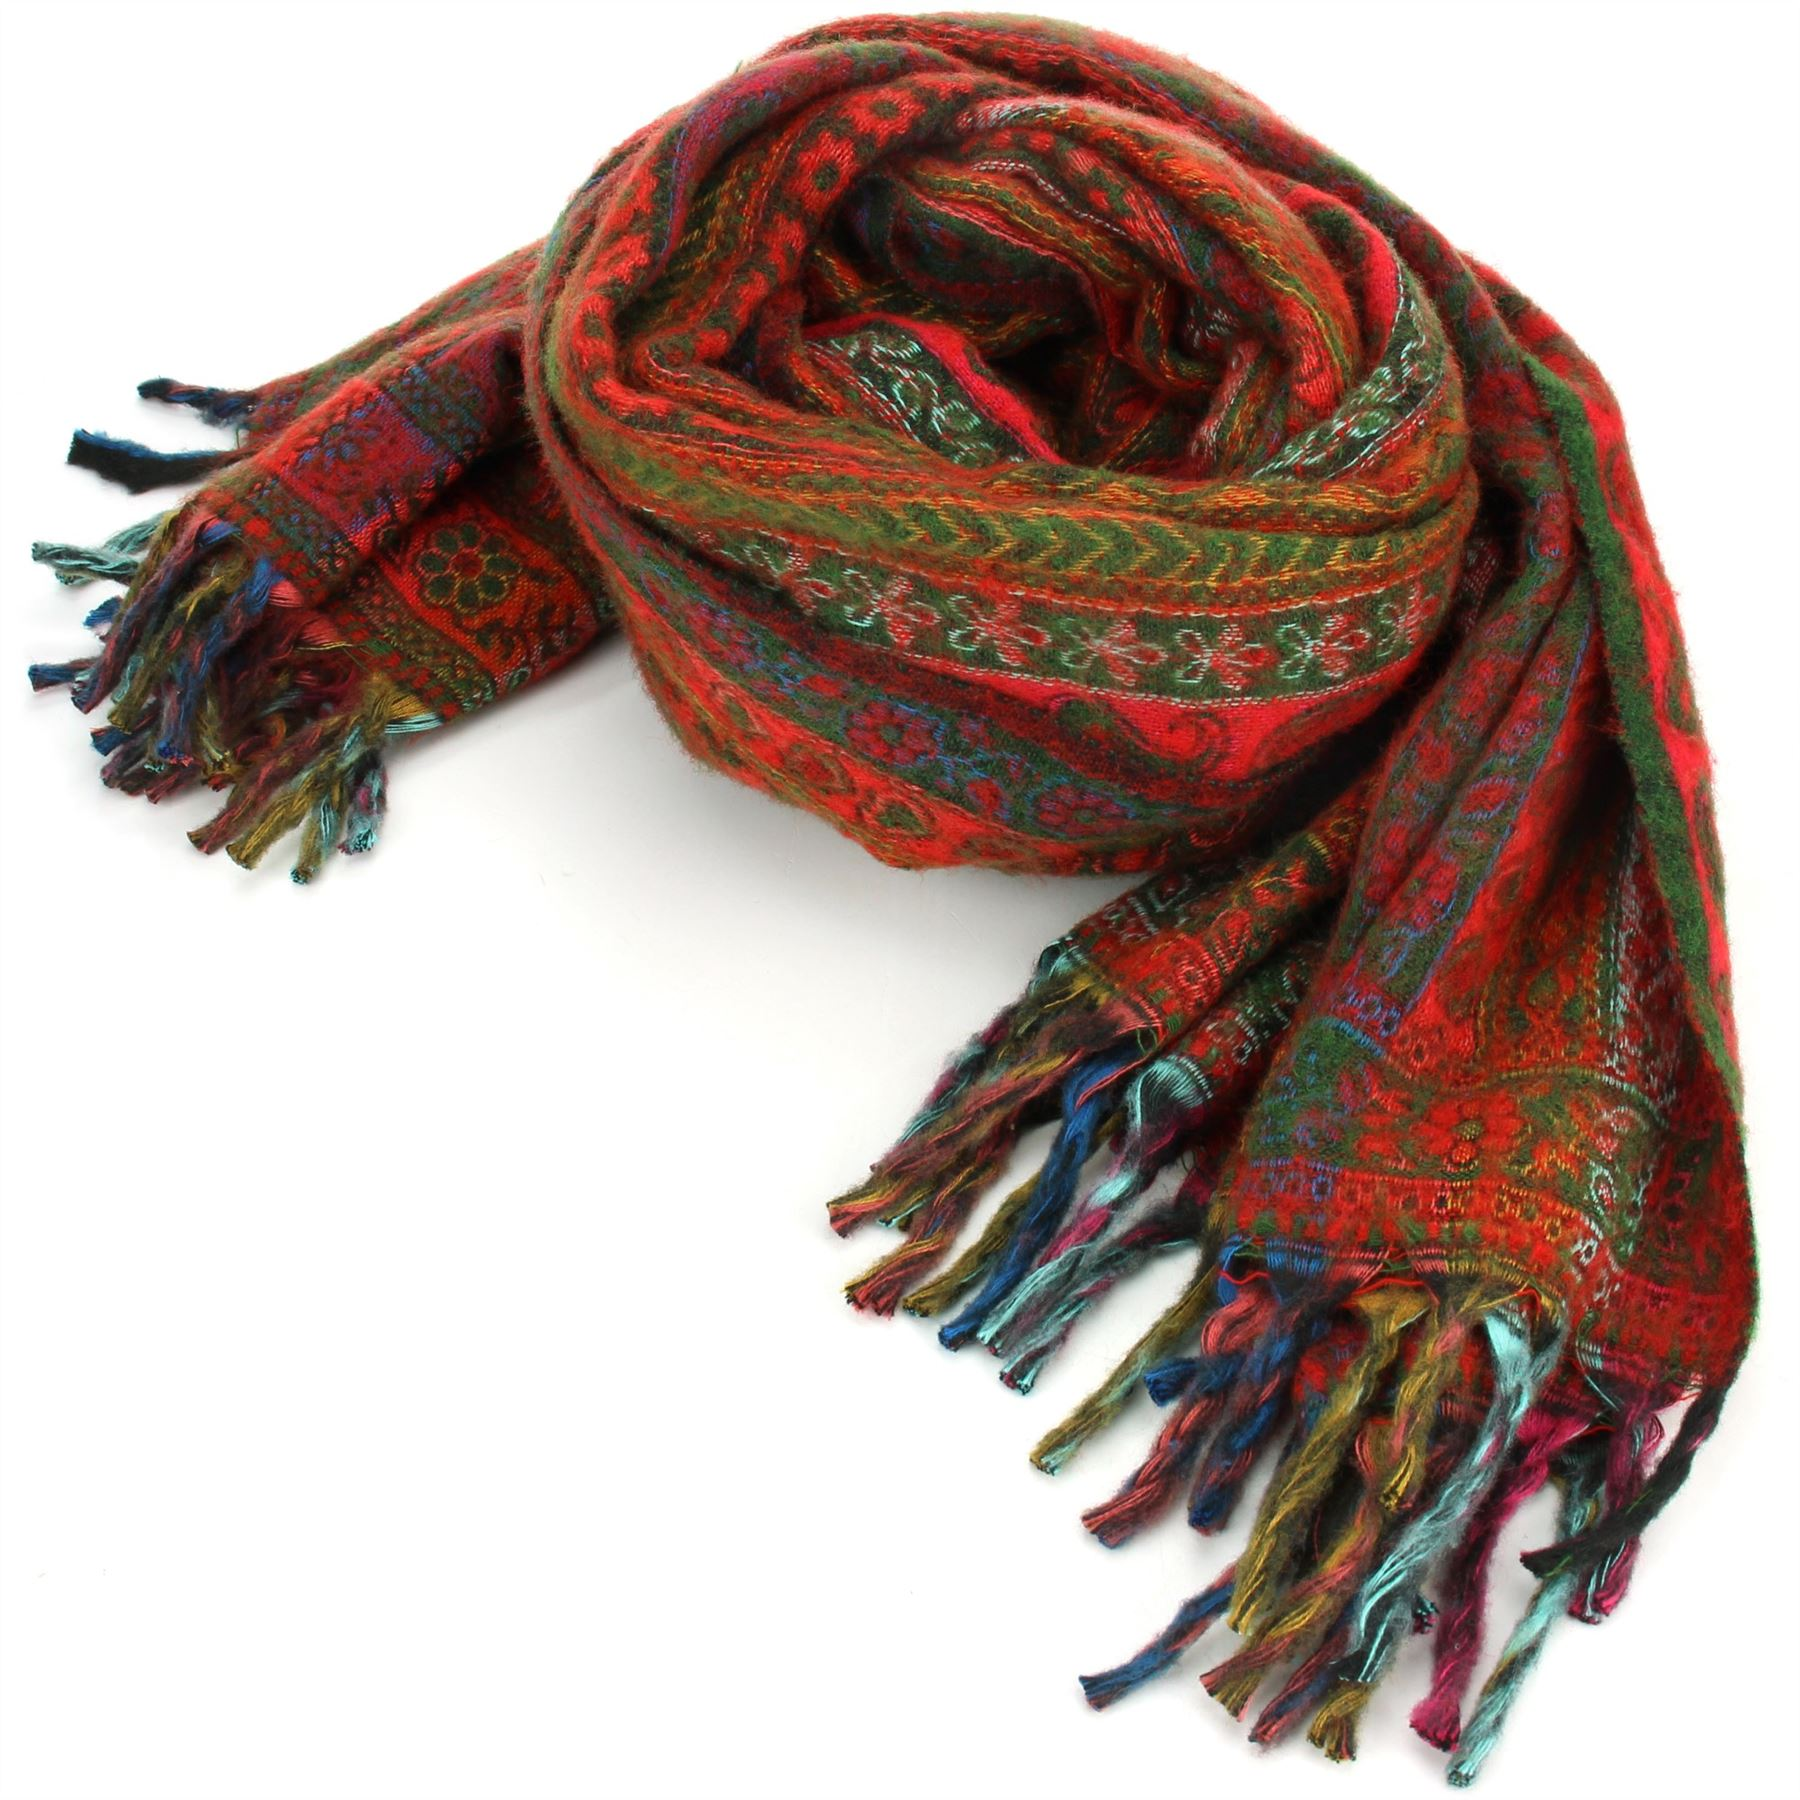 Acrylic-Wool-Blanket-Shawl-Wrap-Throw-Finest-Softest-India-Stripe-Paisley-Travel thumbnail 41